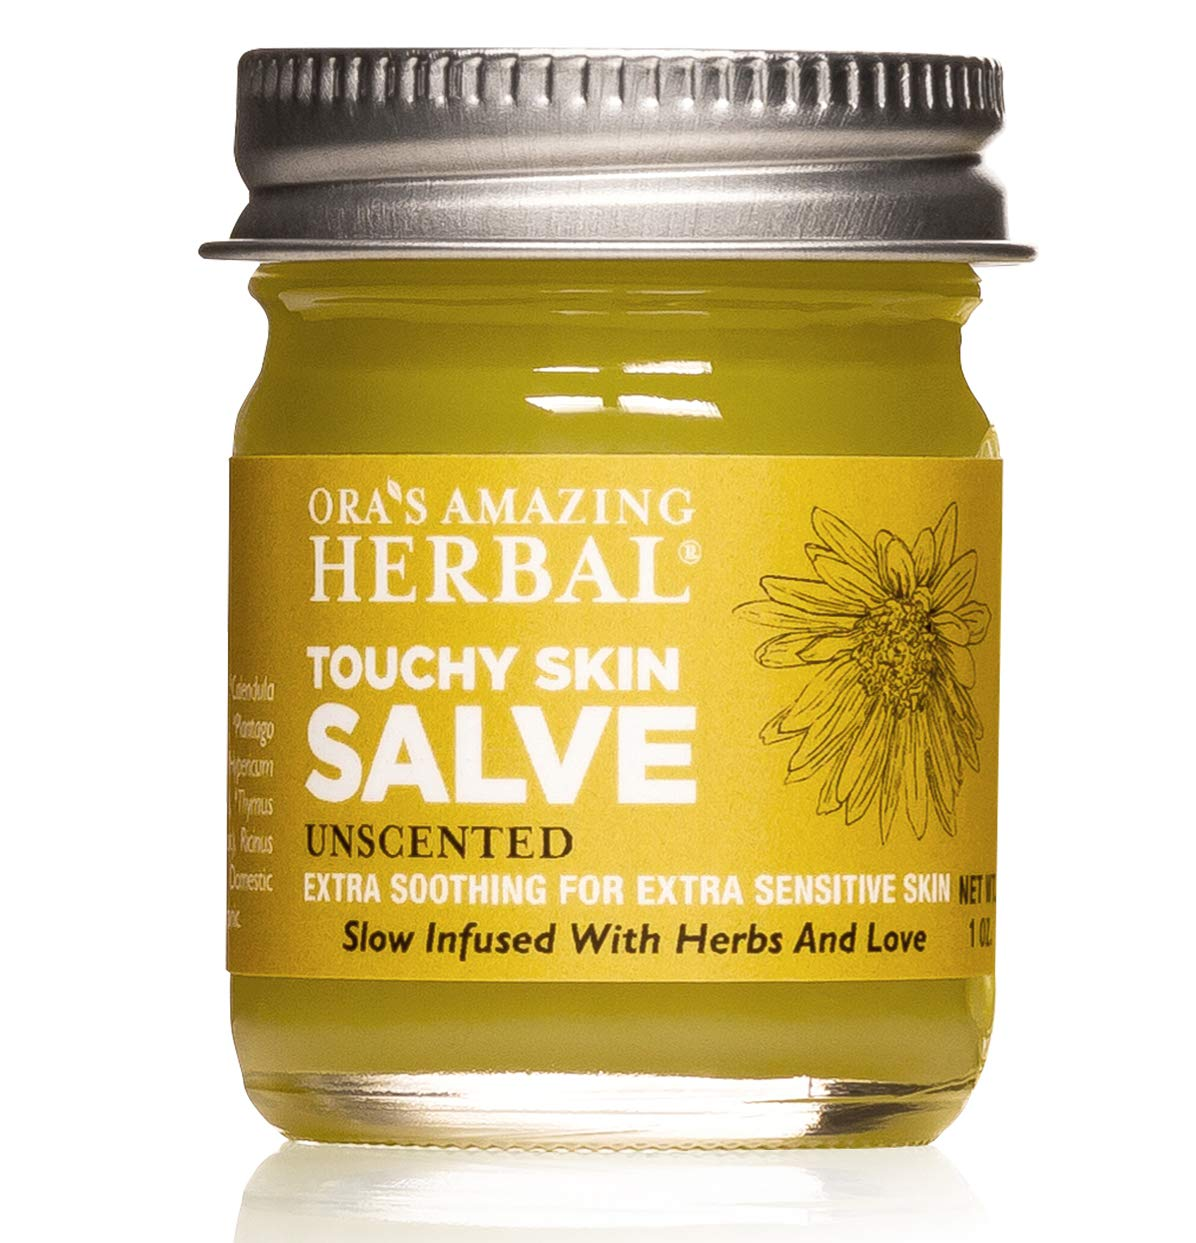 Touchy Skin Salve, Eczema Cream For Adults and Kids, Eczema Treatment, Calendula Cream, Dermatitis, Dry Hands, Calendula Ointment, Healing Ointment, Ora's Amazing Herbal